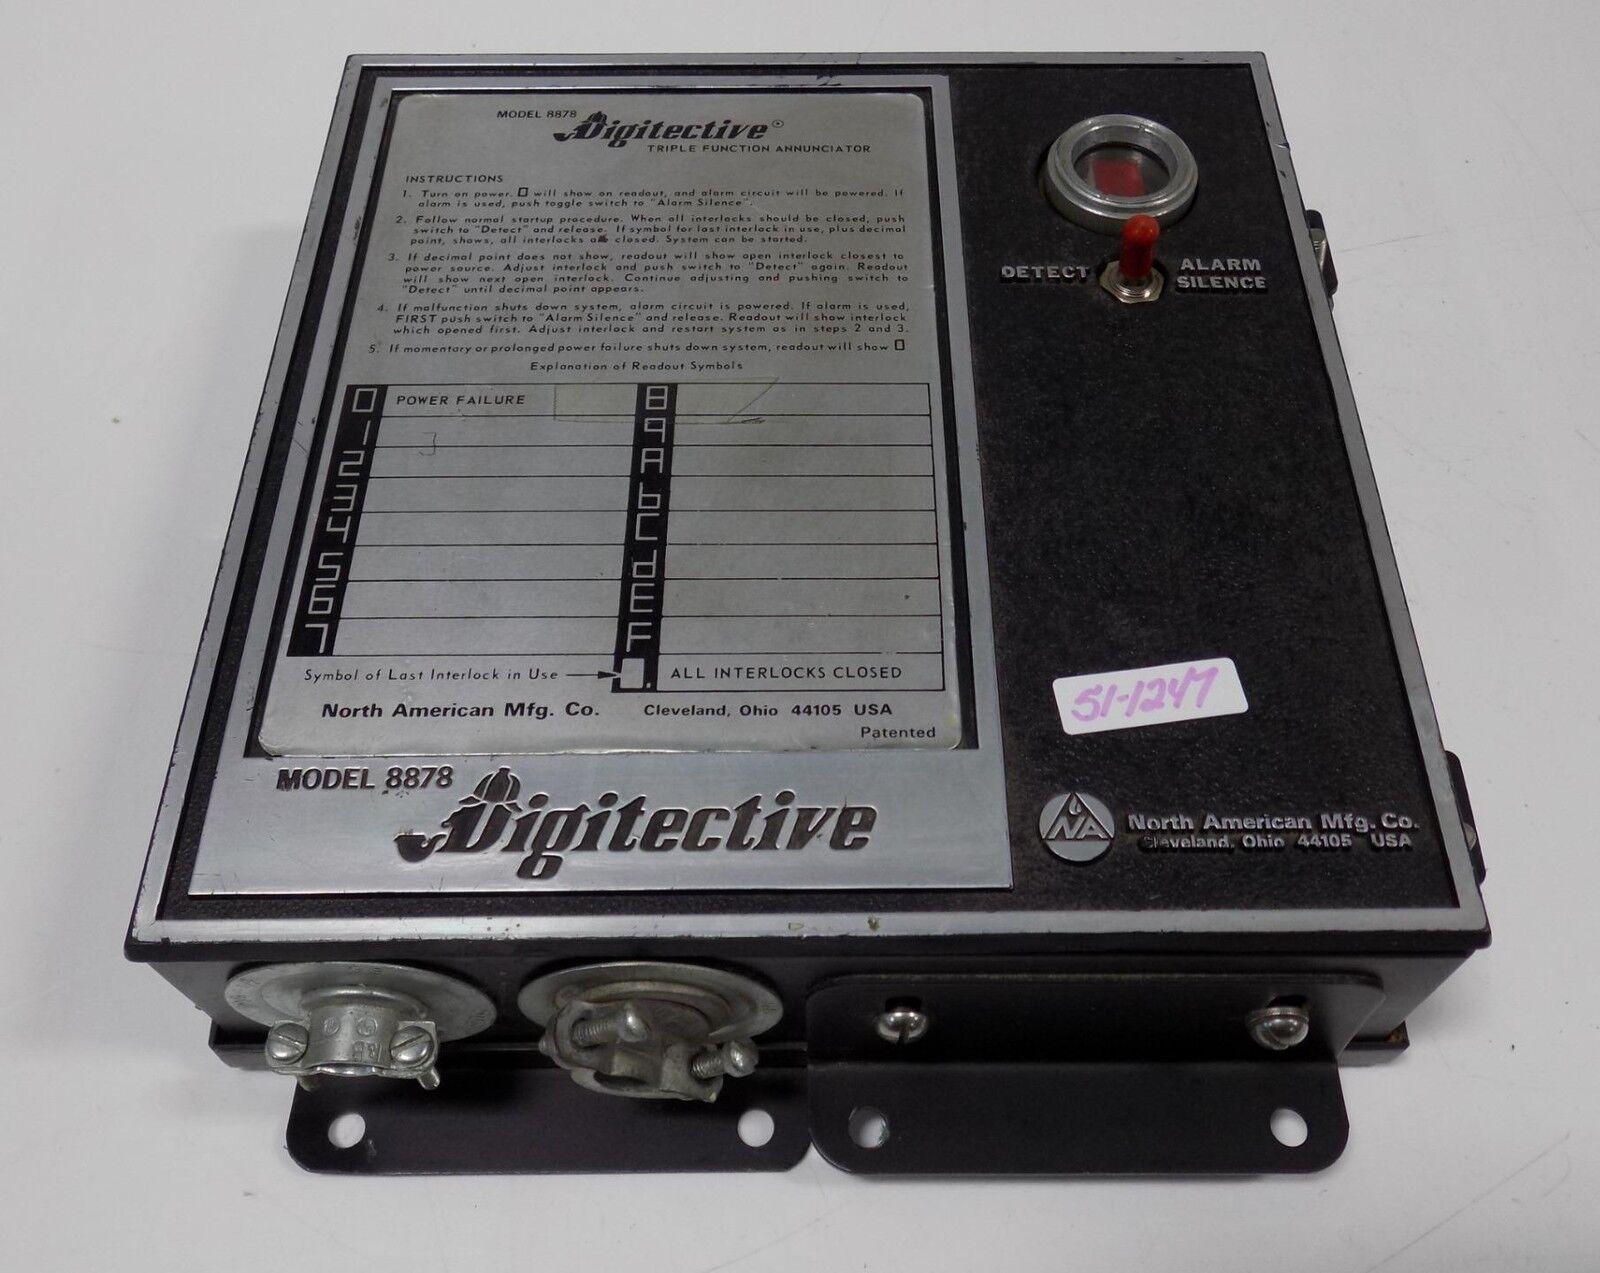 NORTH AMERICAN MFG. DIGITECTIVE ANNUNCIATOR MODEL 8878